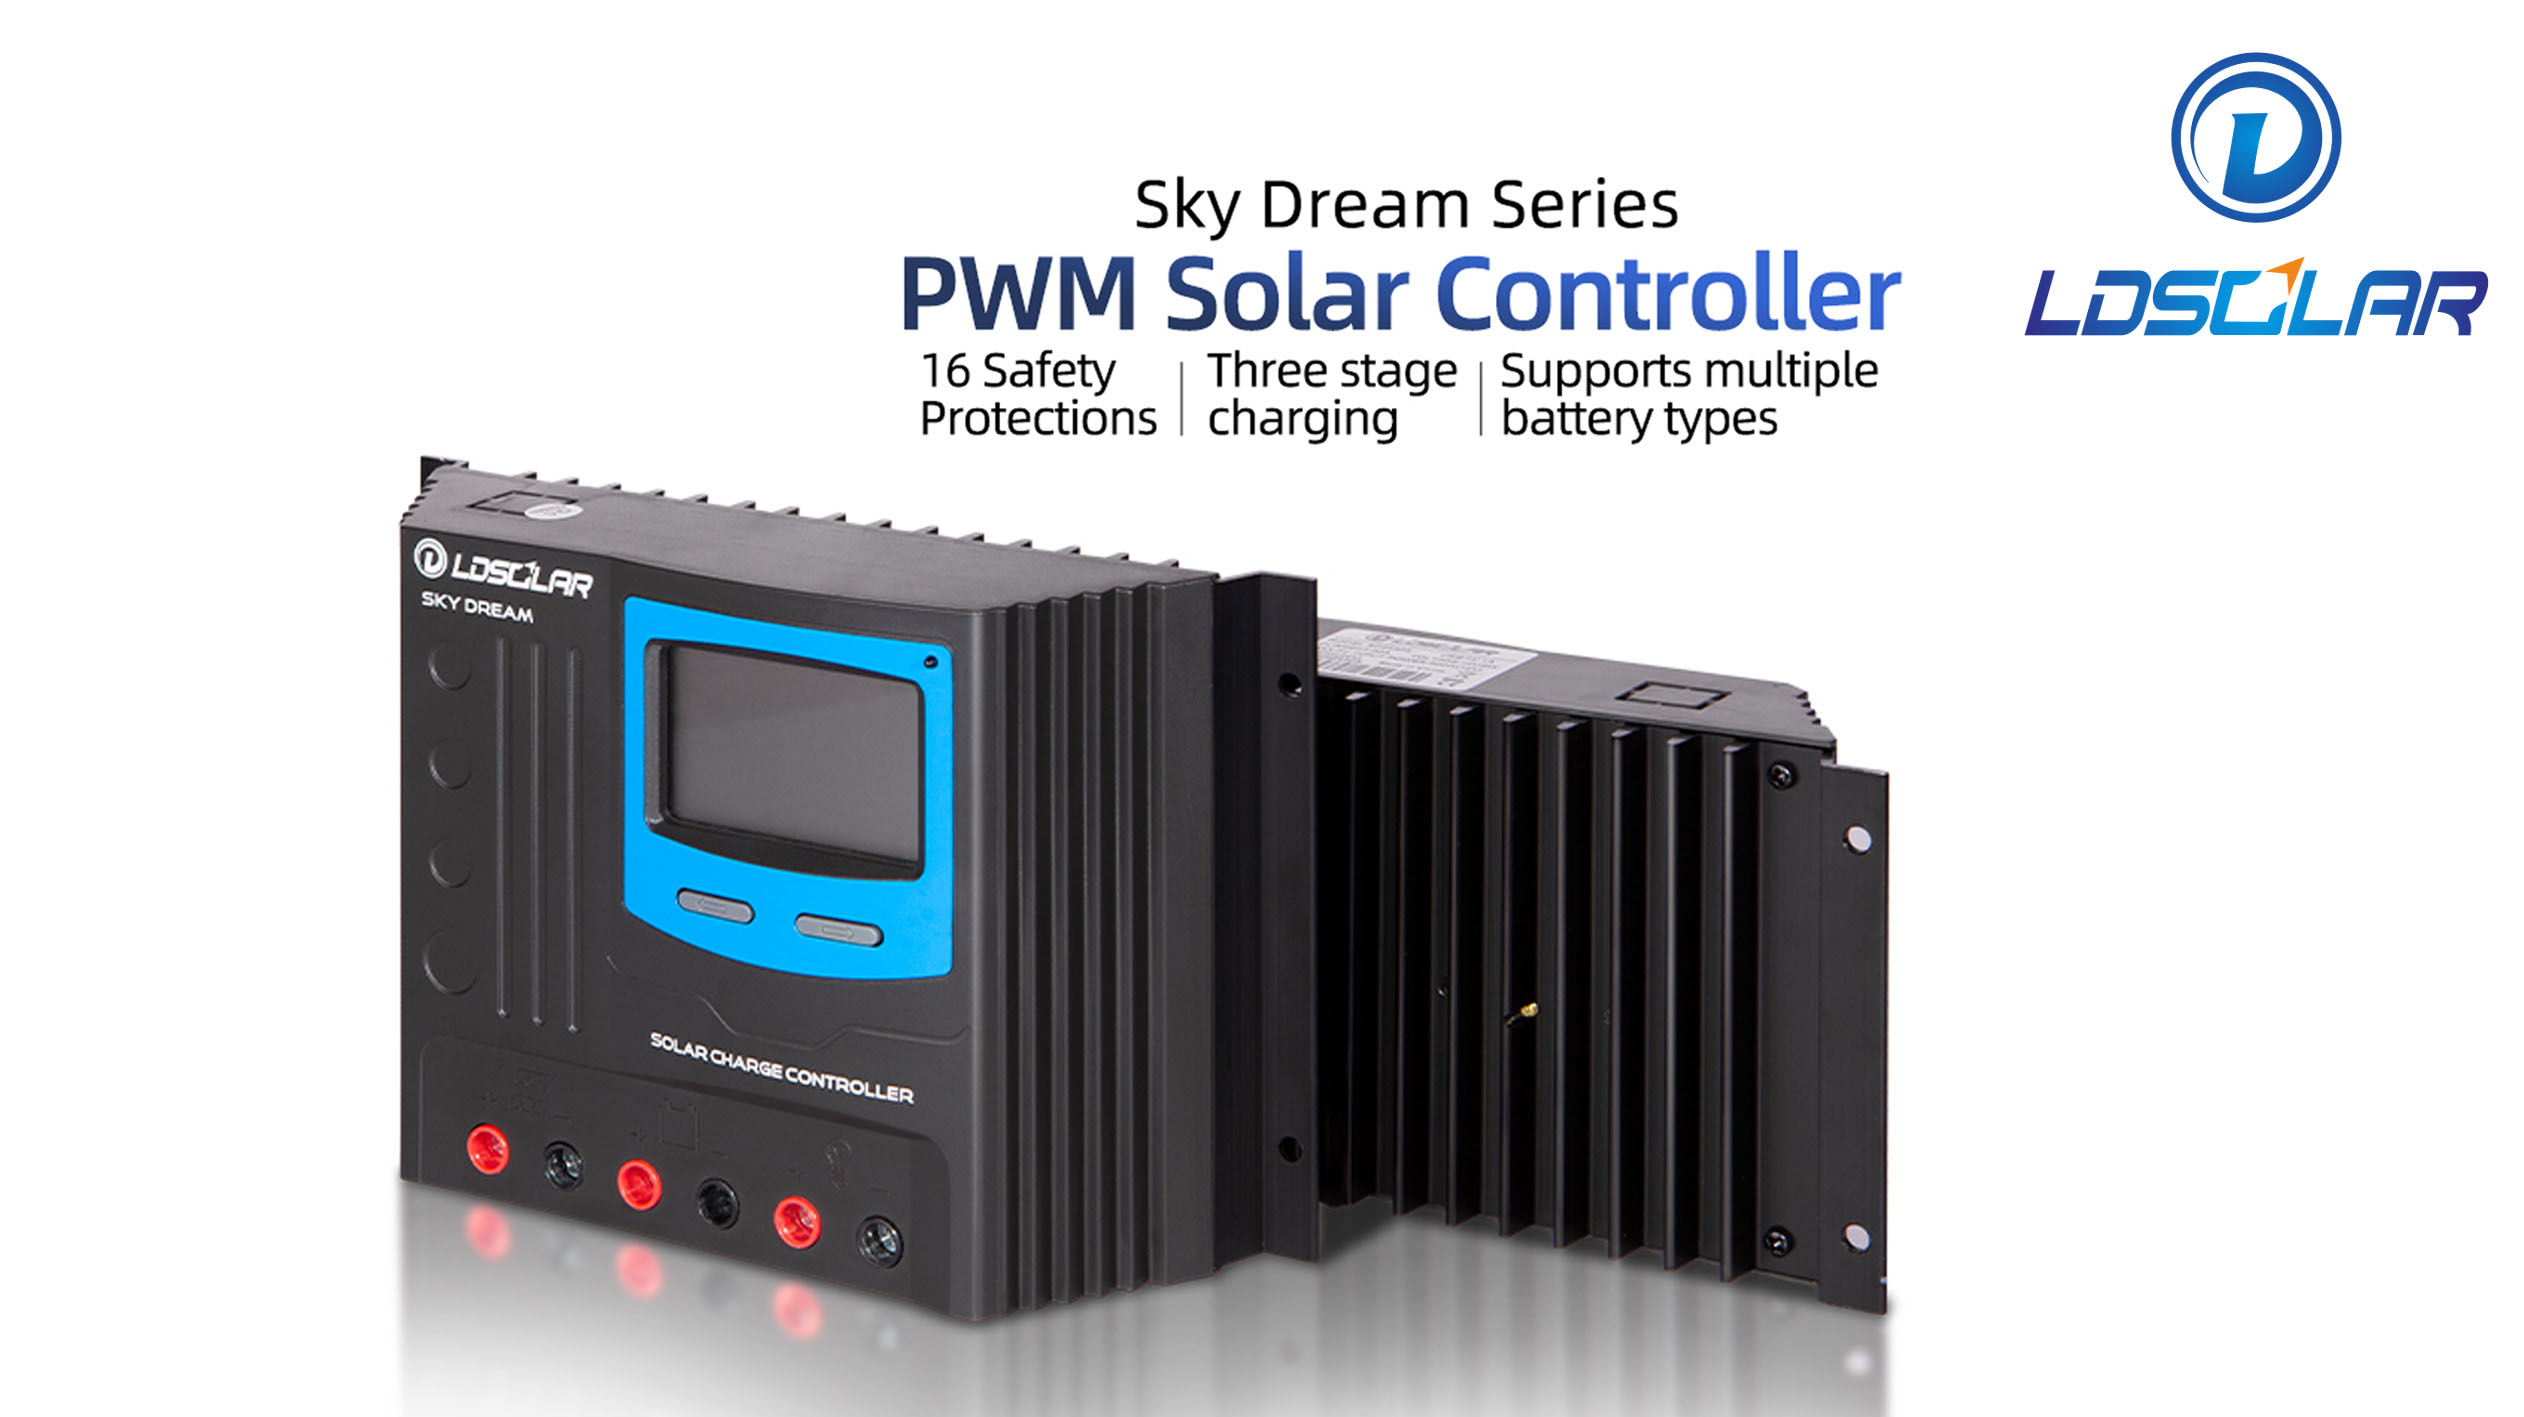 ldsolar Sky Dream series PWM solar charge controller